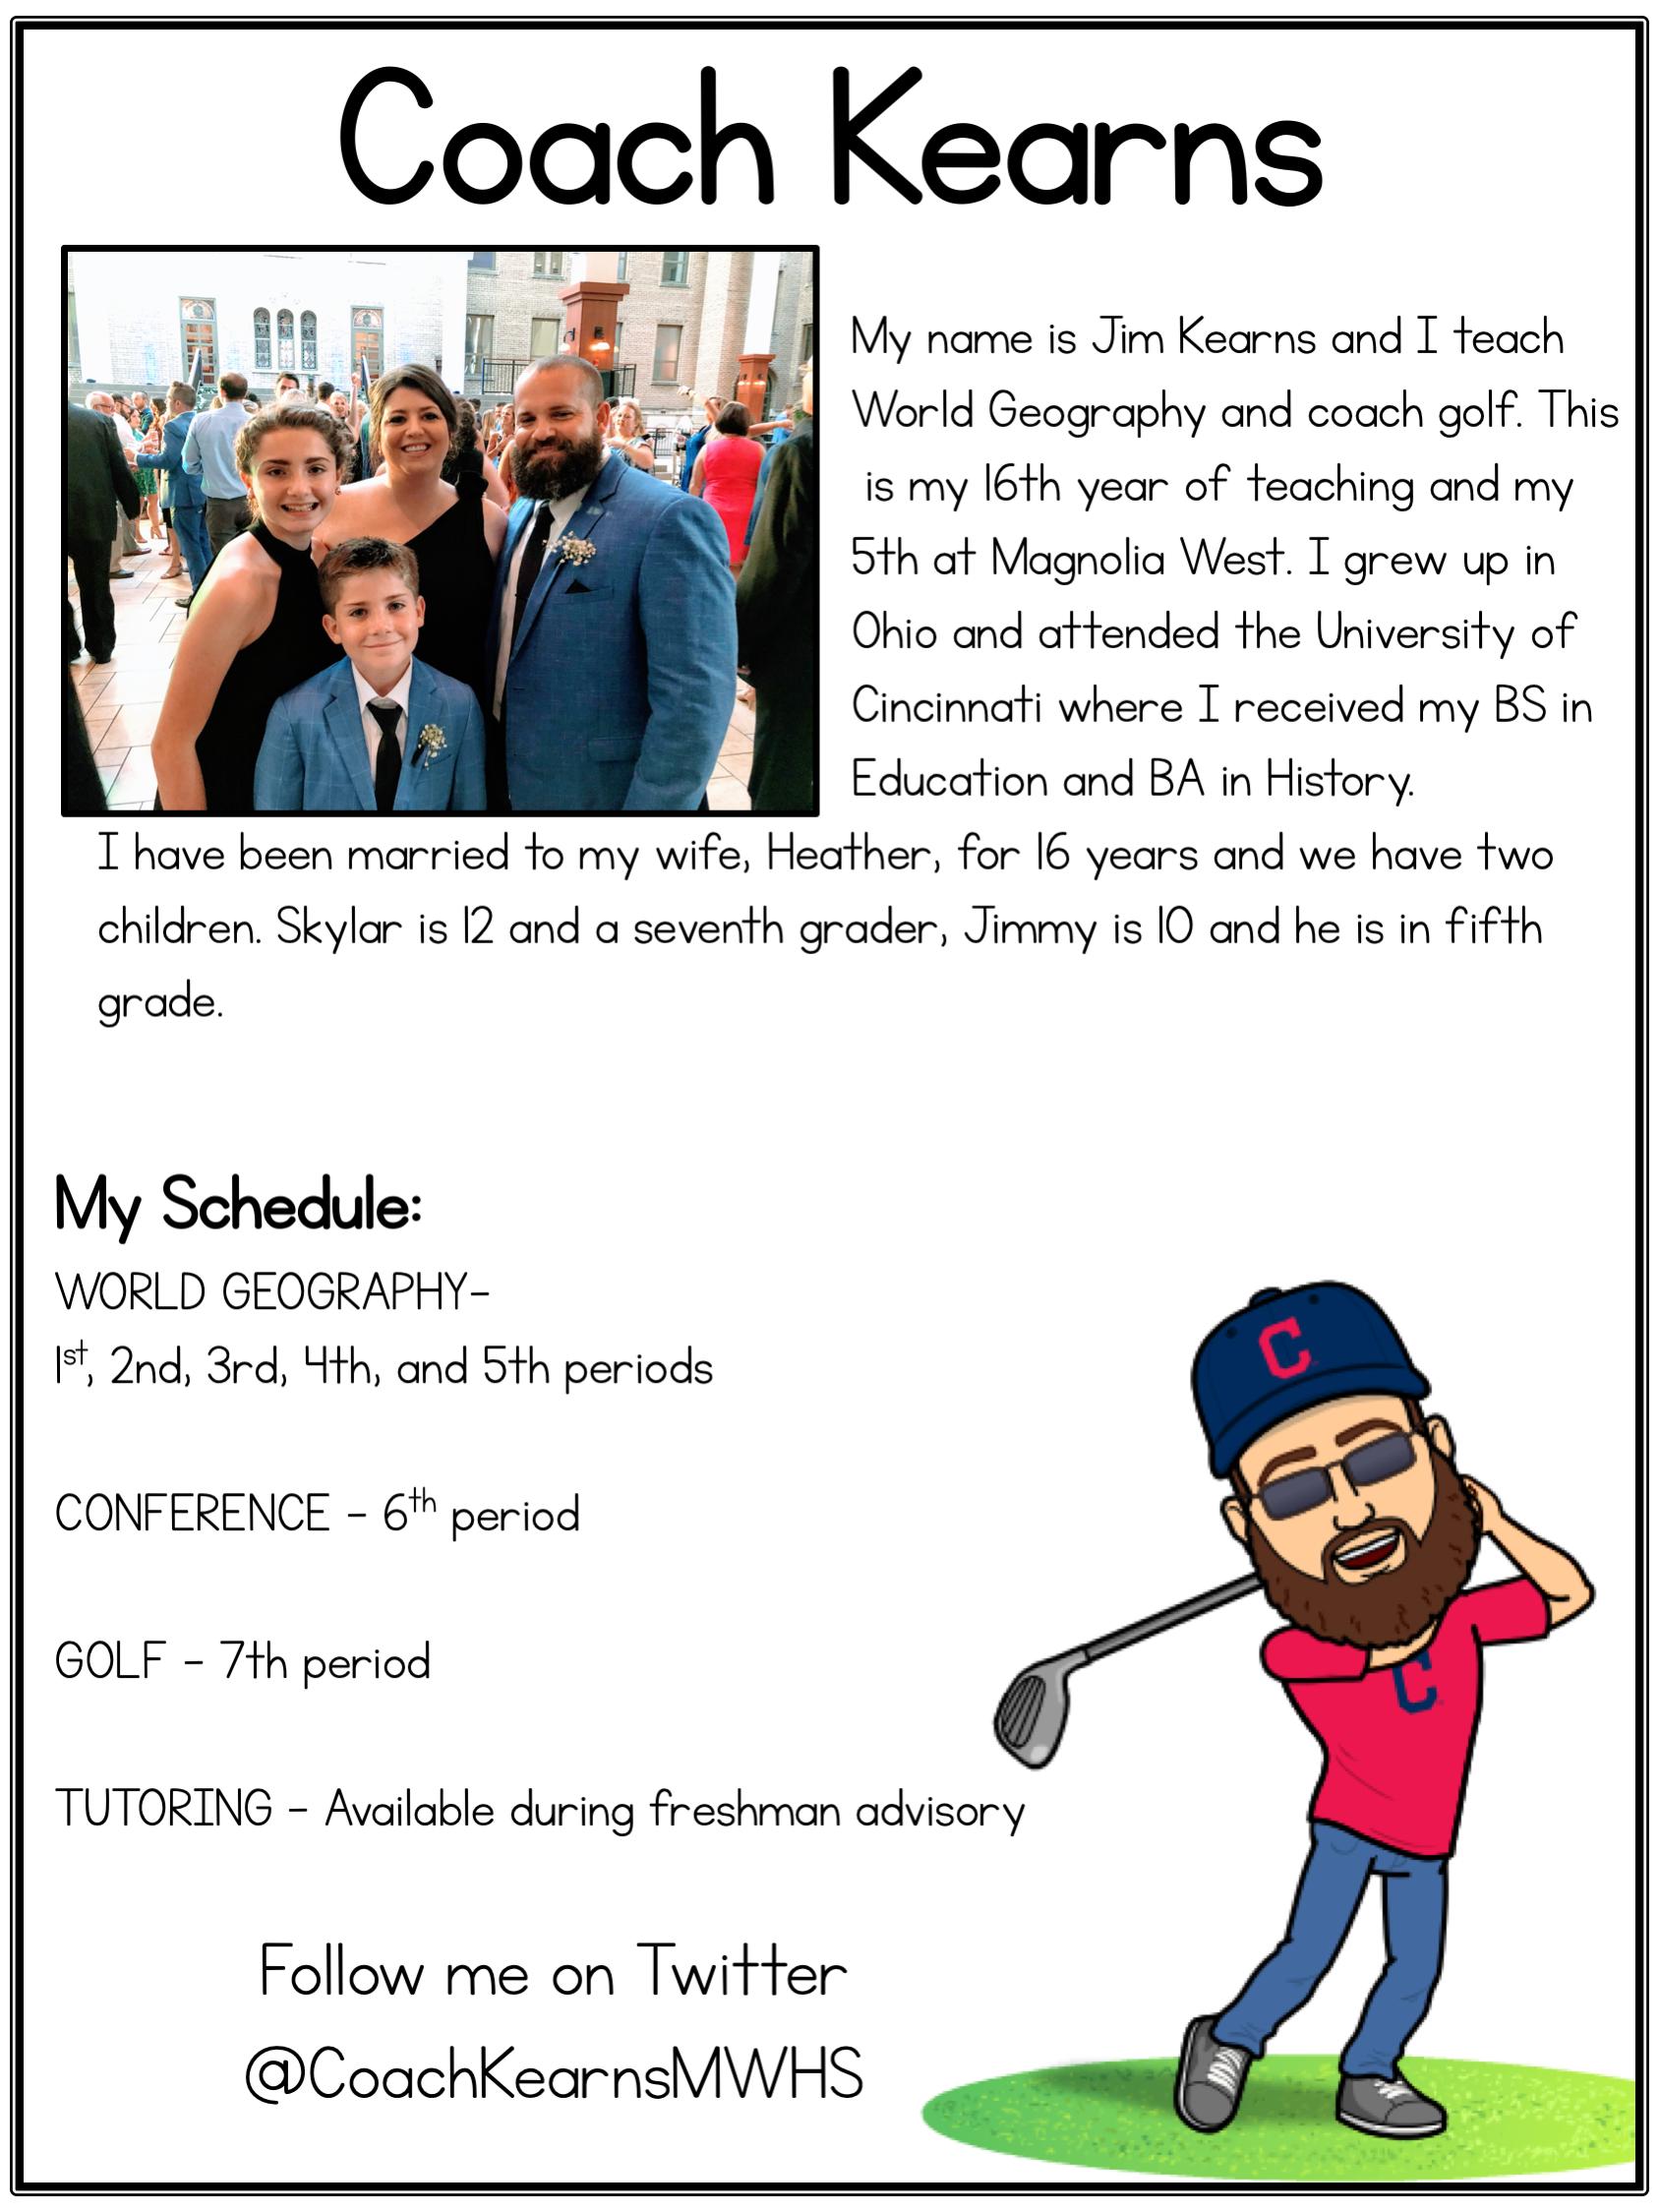 Coach Kearns Landing Page